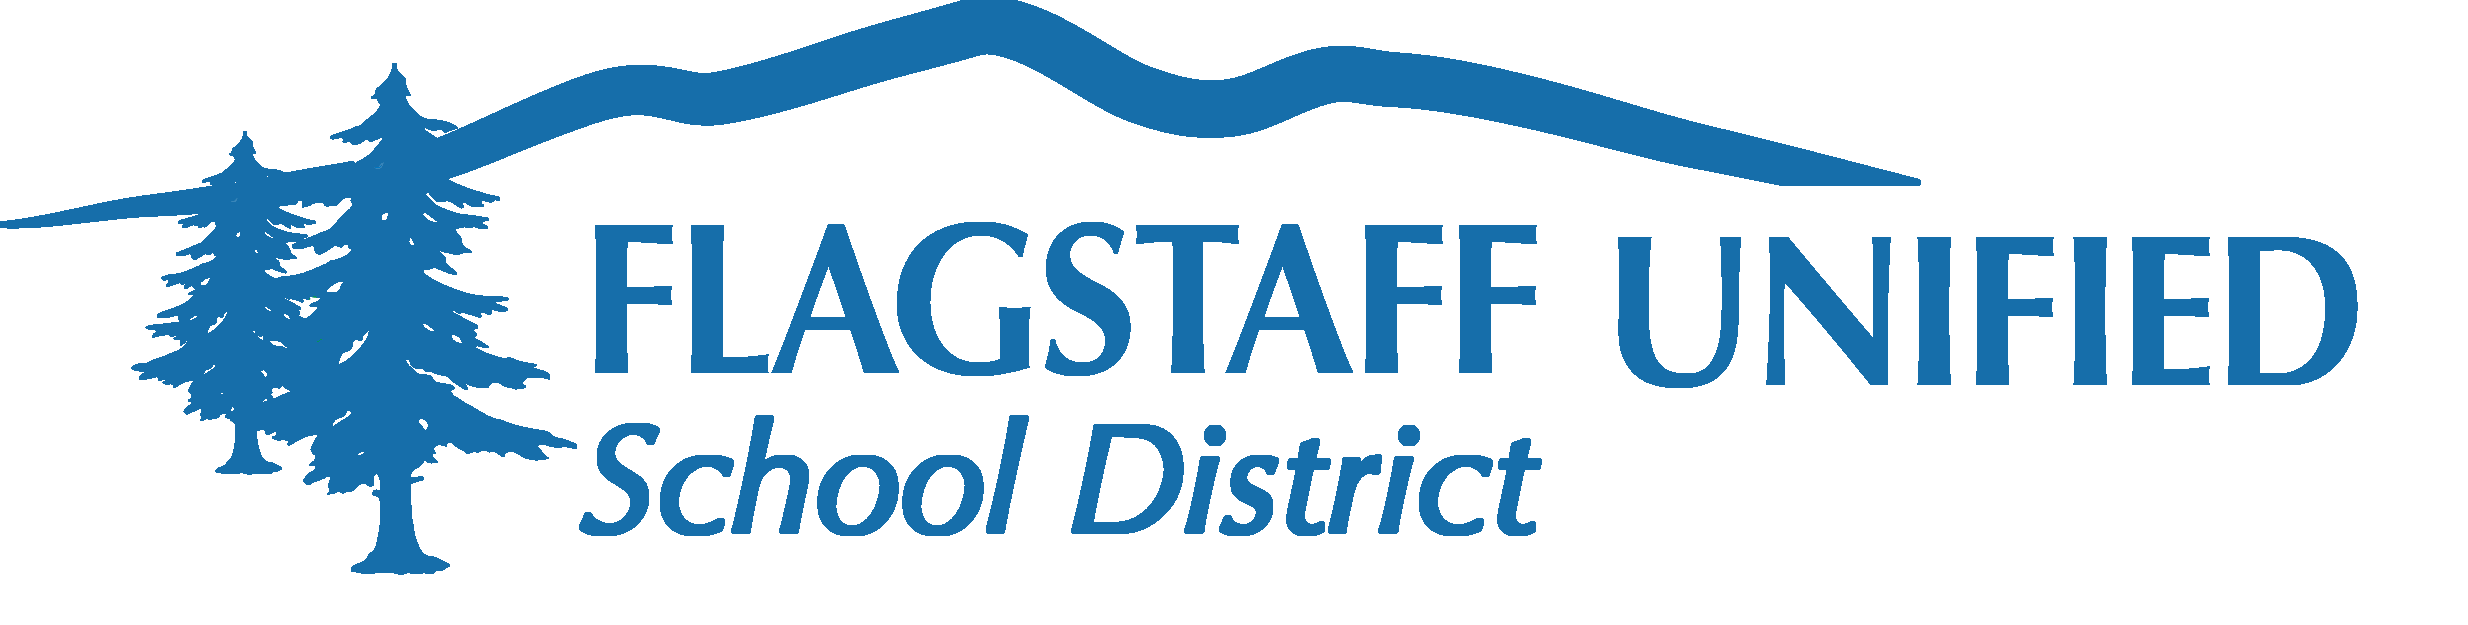 Flag Staff United School District